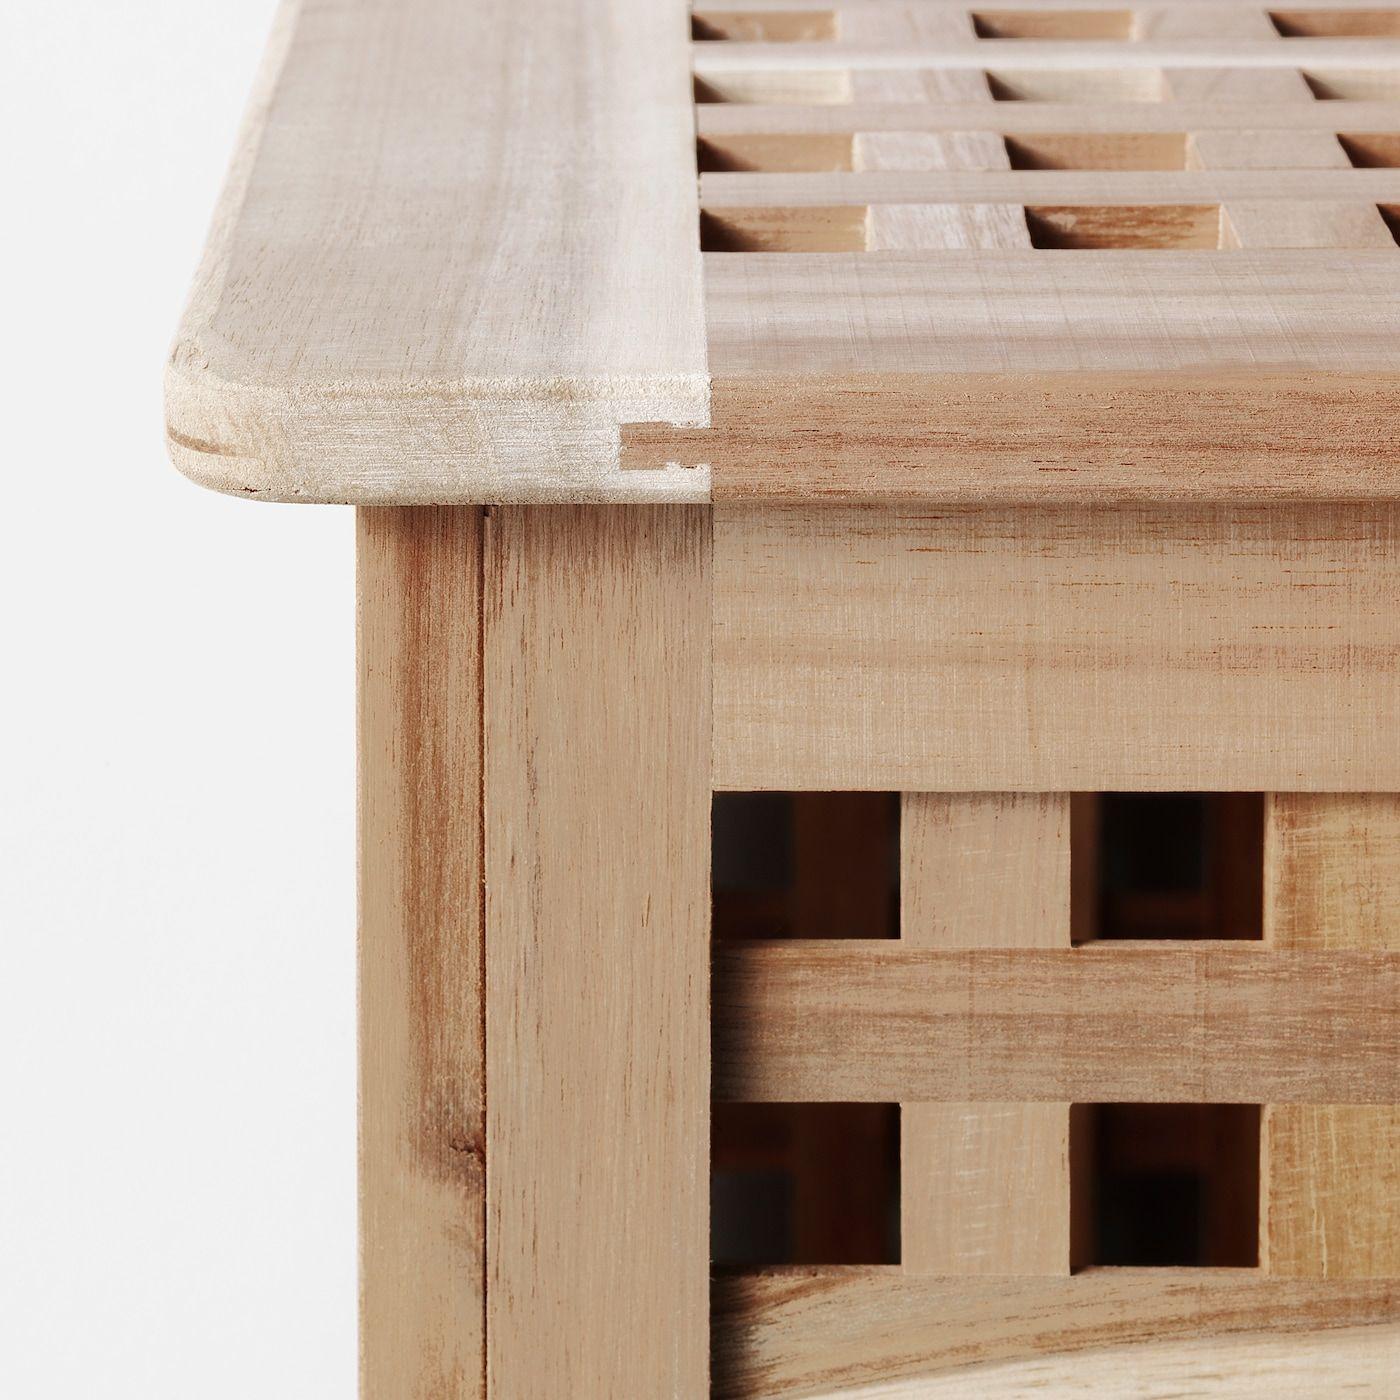 Hol Tavolino Acacia 50x50 Cm Ikea It Ikea Table Storage Wood Console Table [ 1400 x 1400 Pixel ]